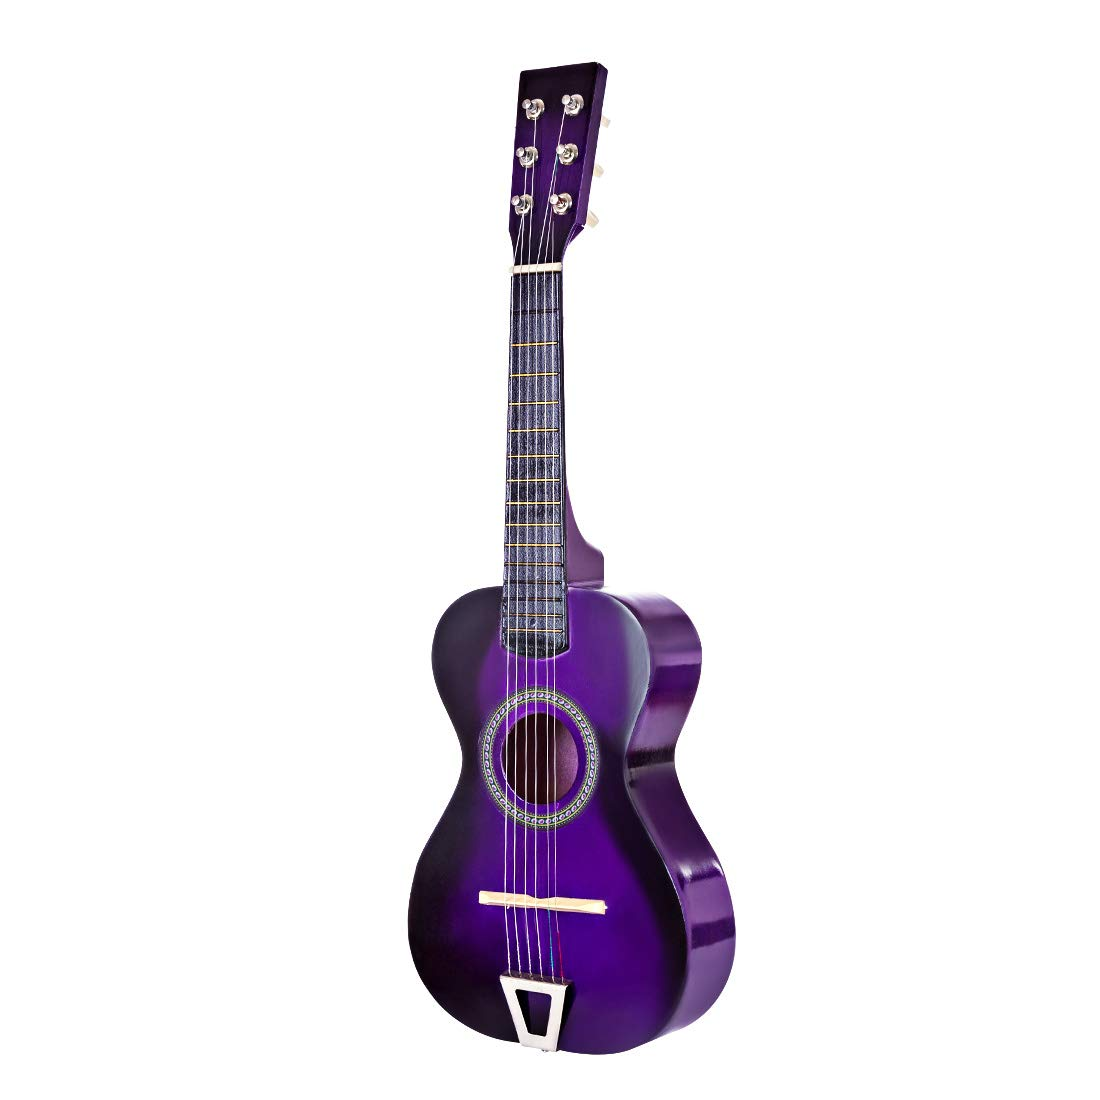 FenglinTech Kids Guitar, 23inch 6 Strings Children Wooden Acoustic Guitar Musical Instrument Toy for Children Beginner - (Purple)